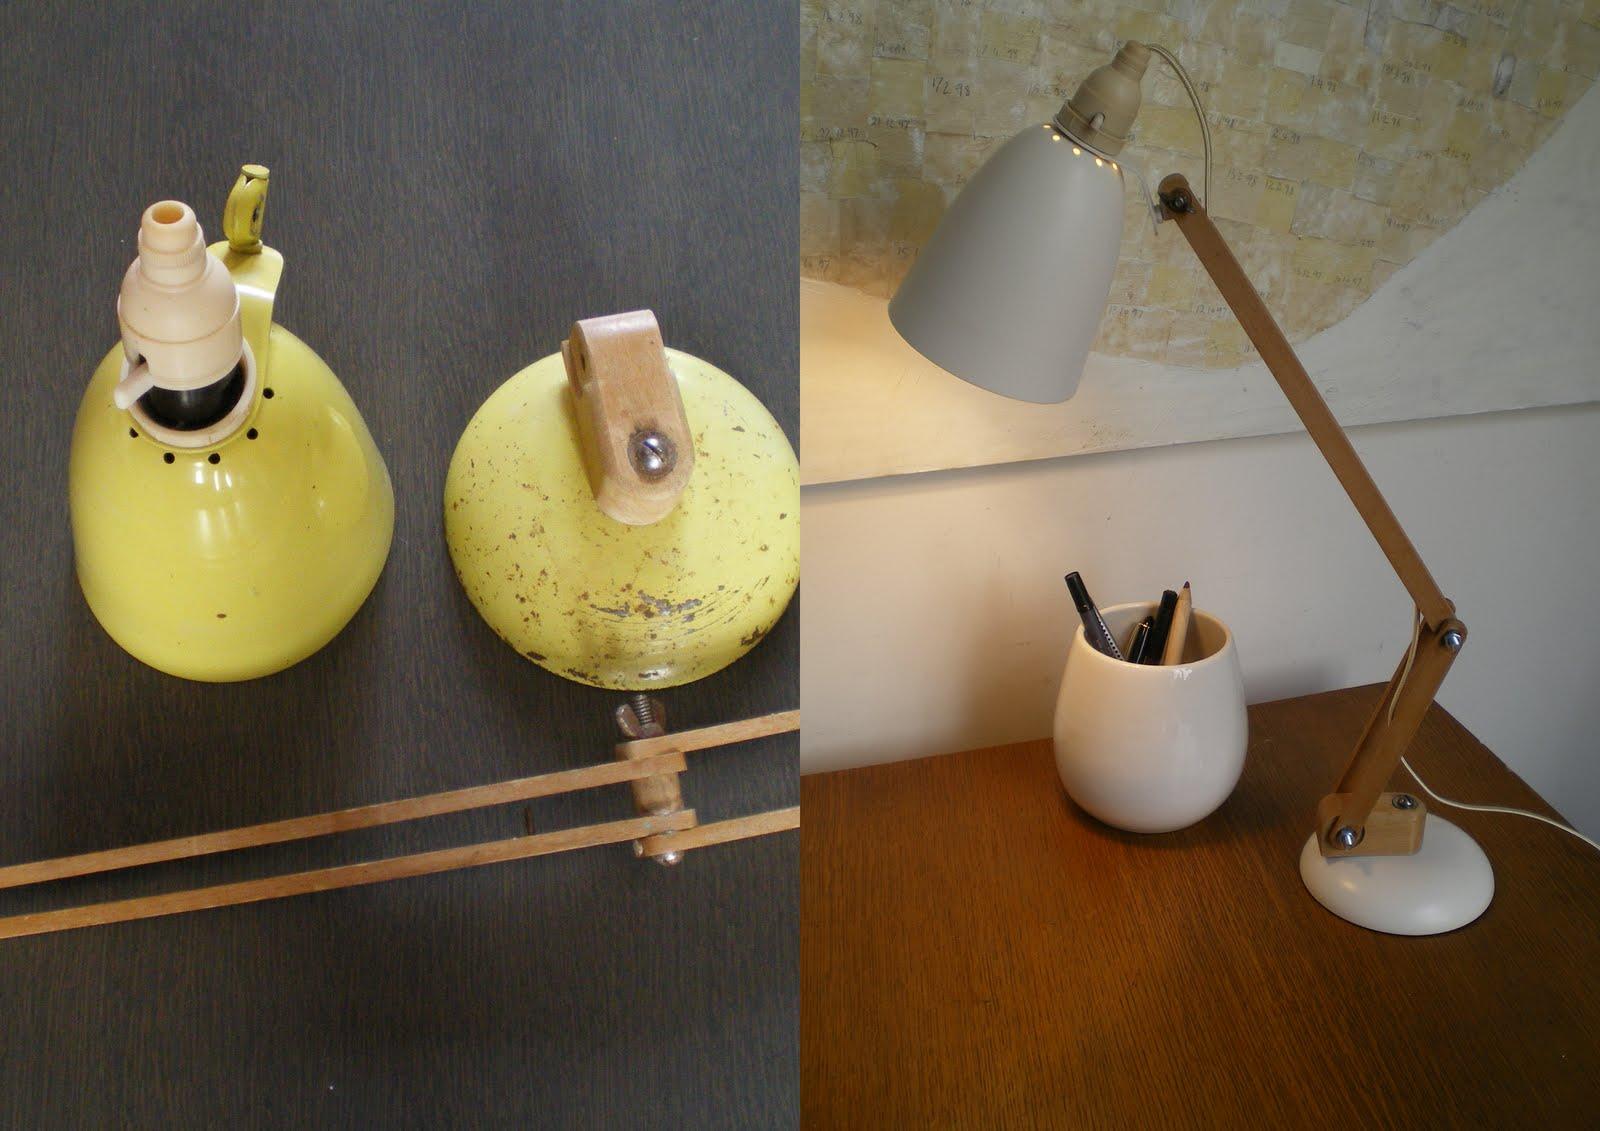 studio nord bricolage du dimanche. Black Bedroom Furniture Sets. Home Design Ideas